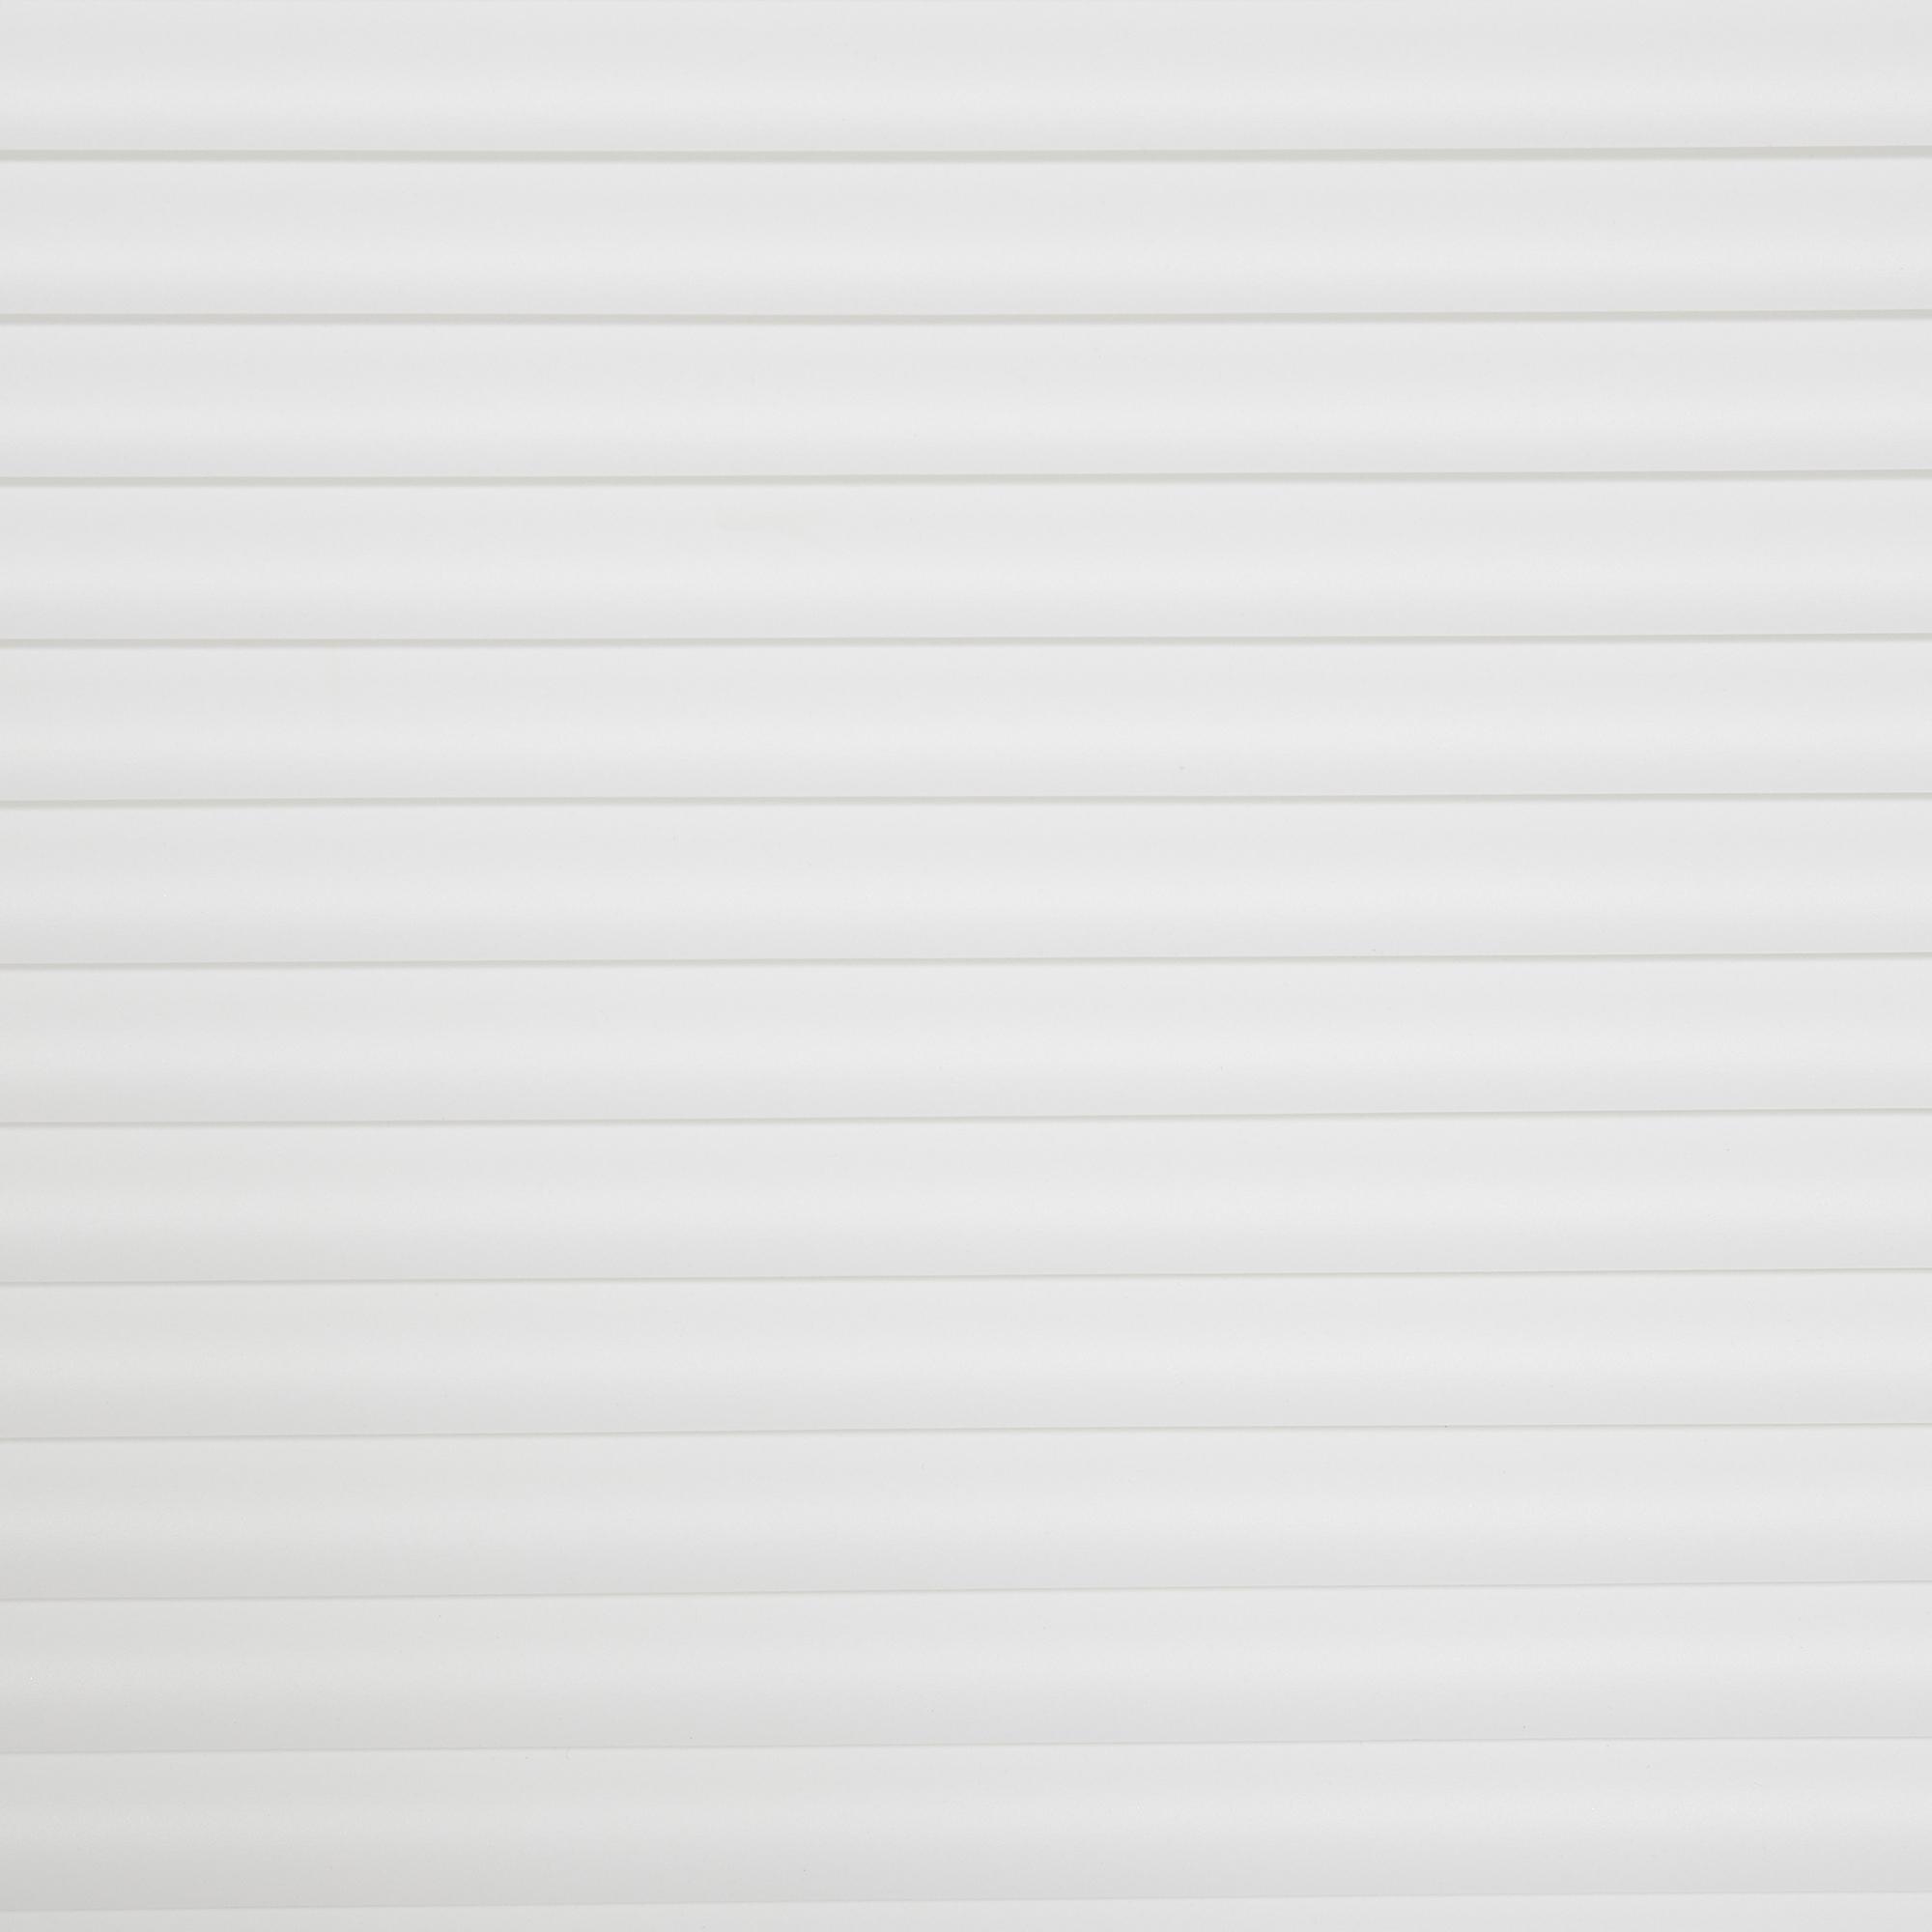 Cordless 1 Inch Light Filtering Mini Blind 47 In W X 64 In L White Multiple Sizes Walmart Com Walmart Com